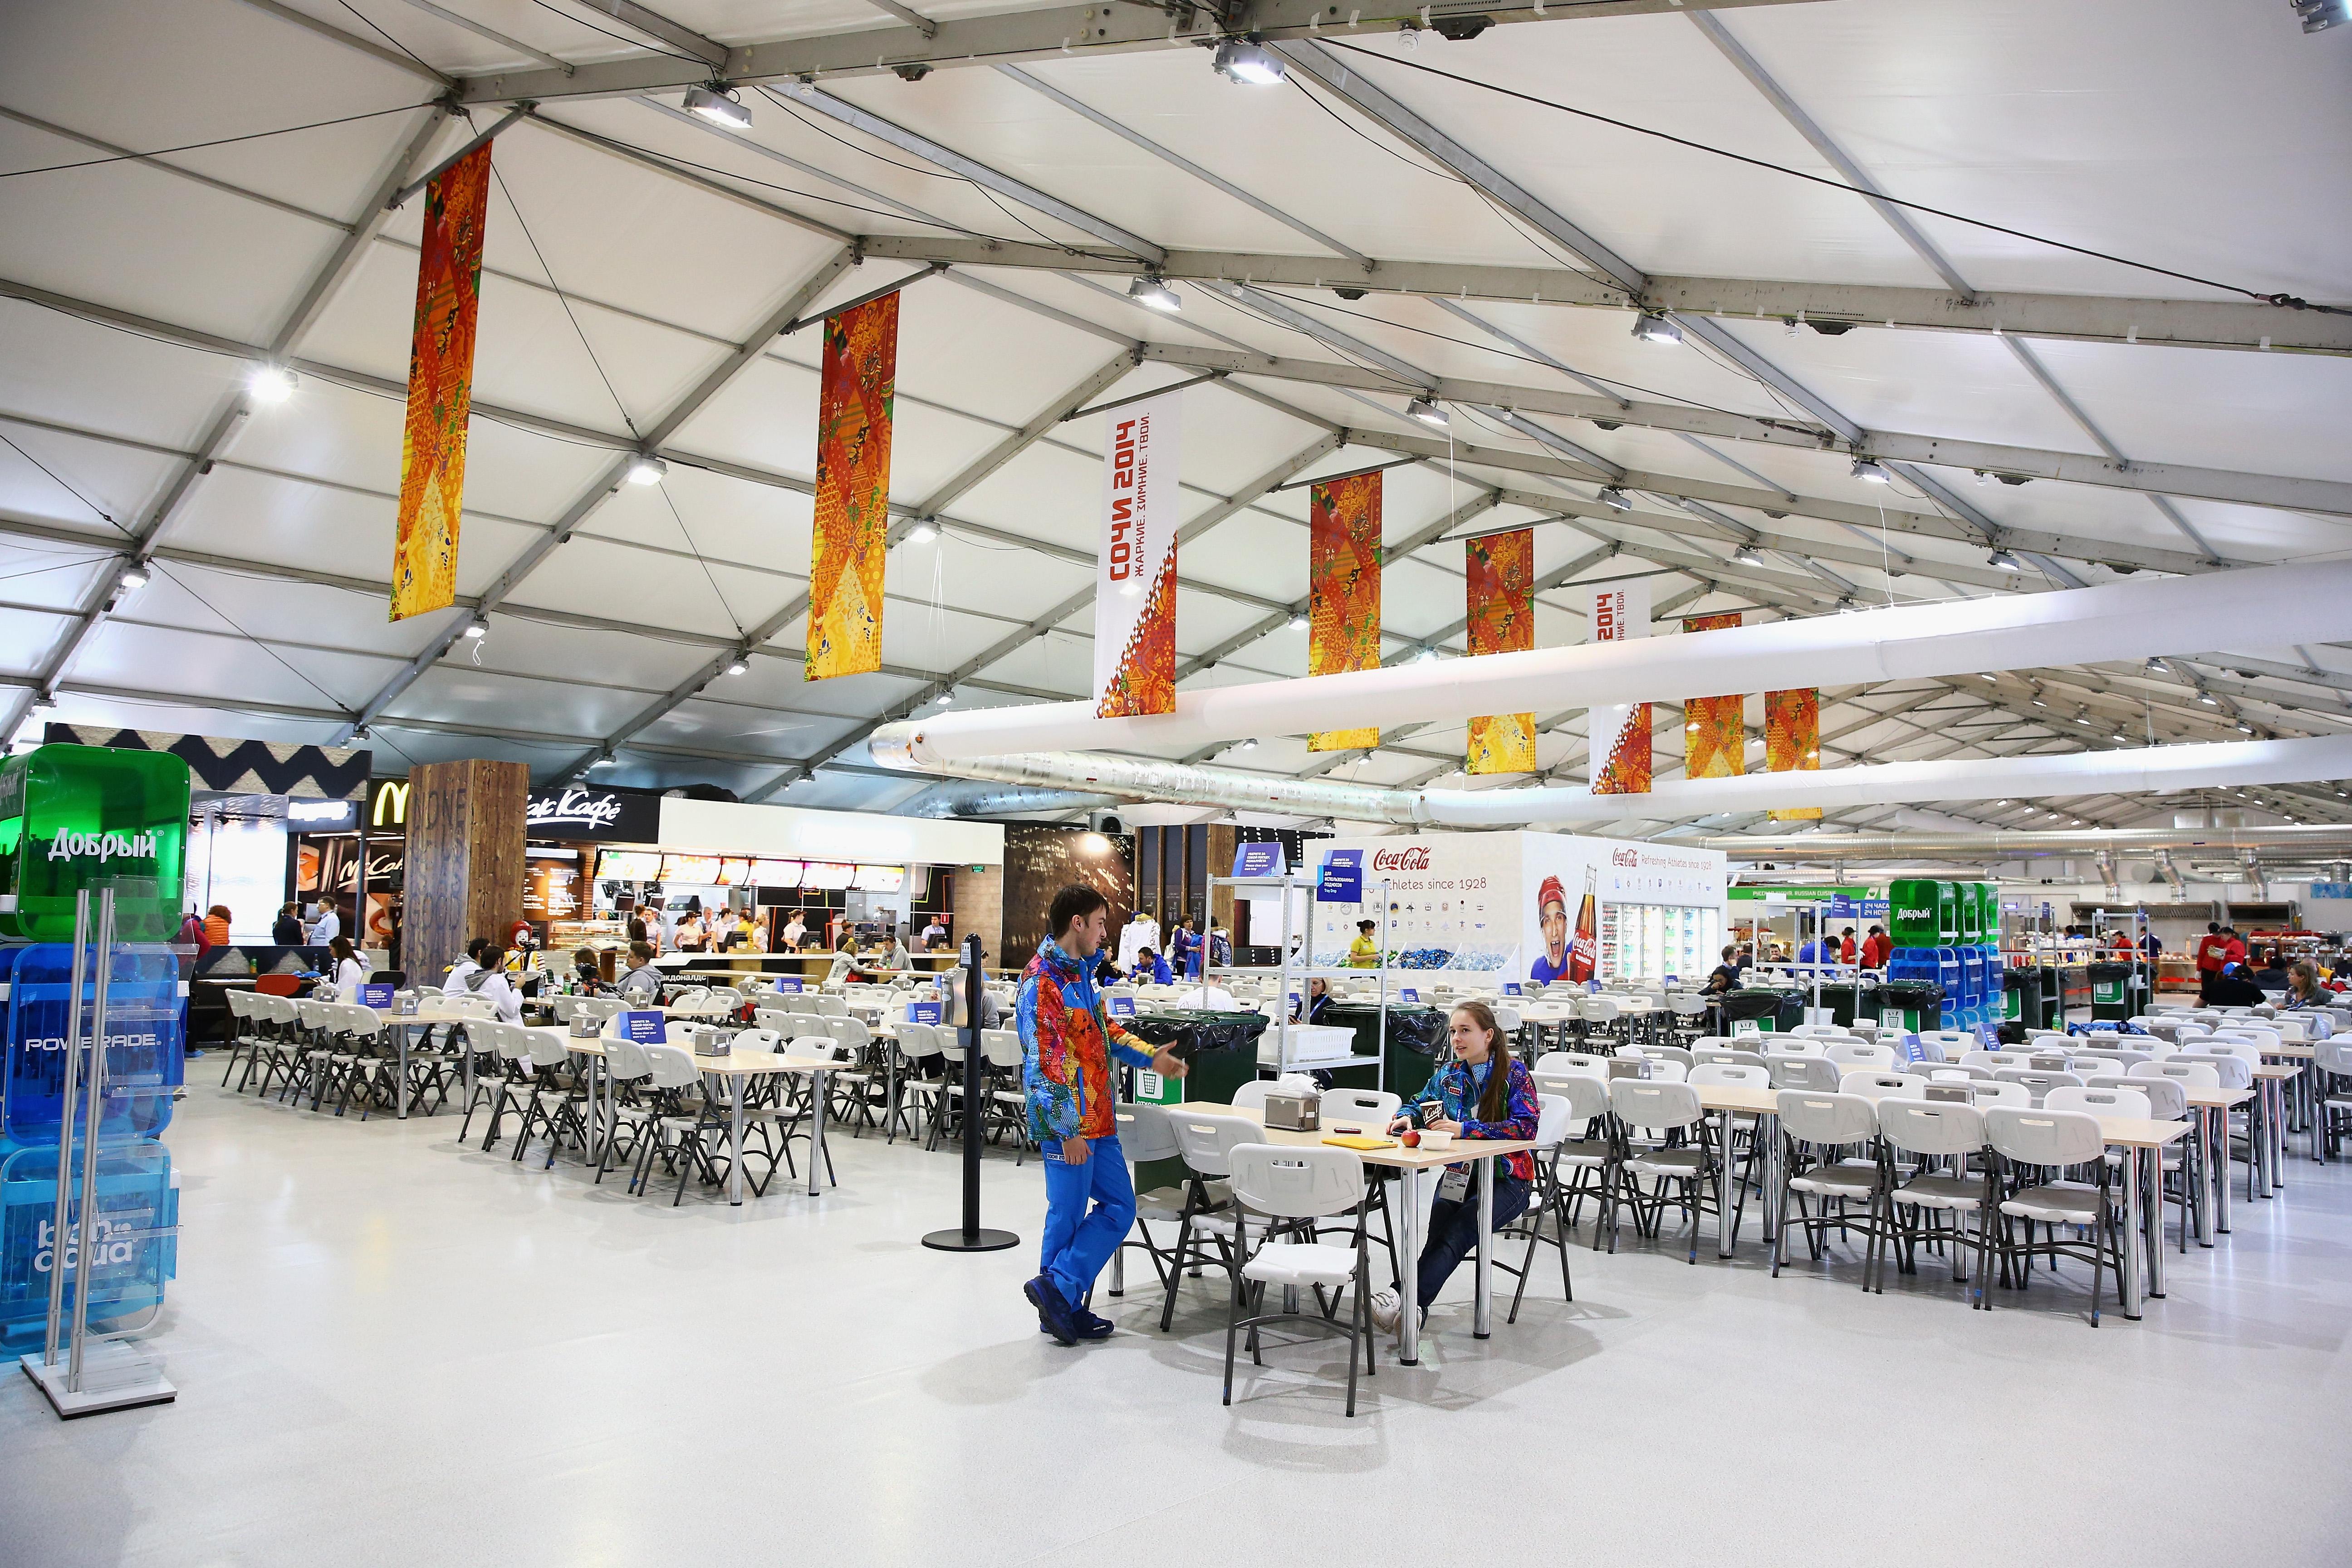 Sochi 2014 Dining Hall